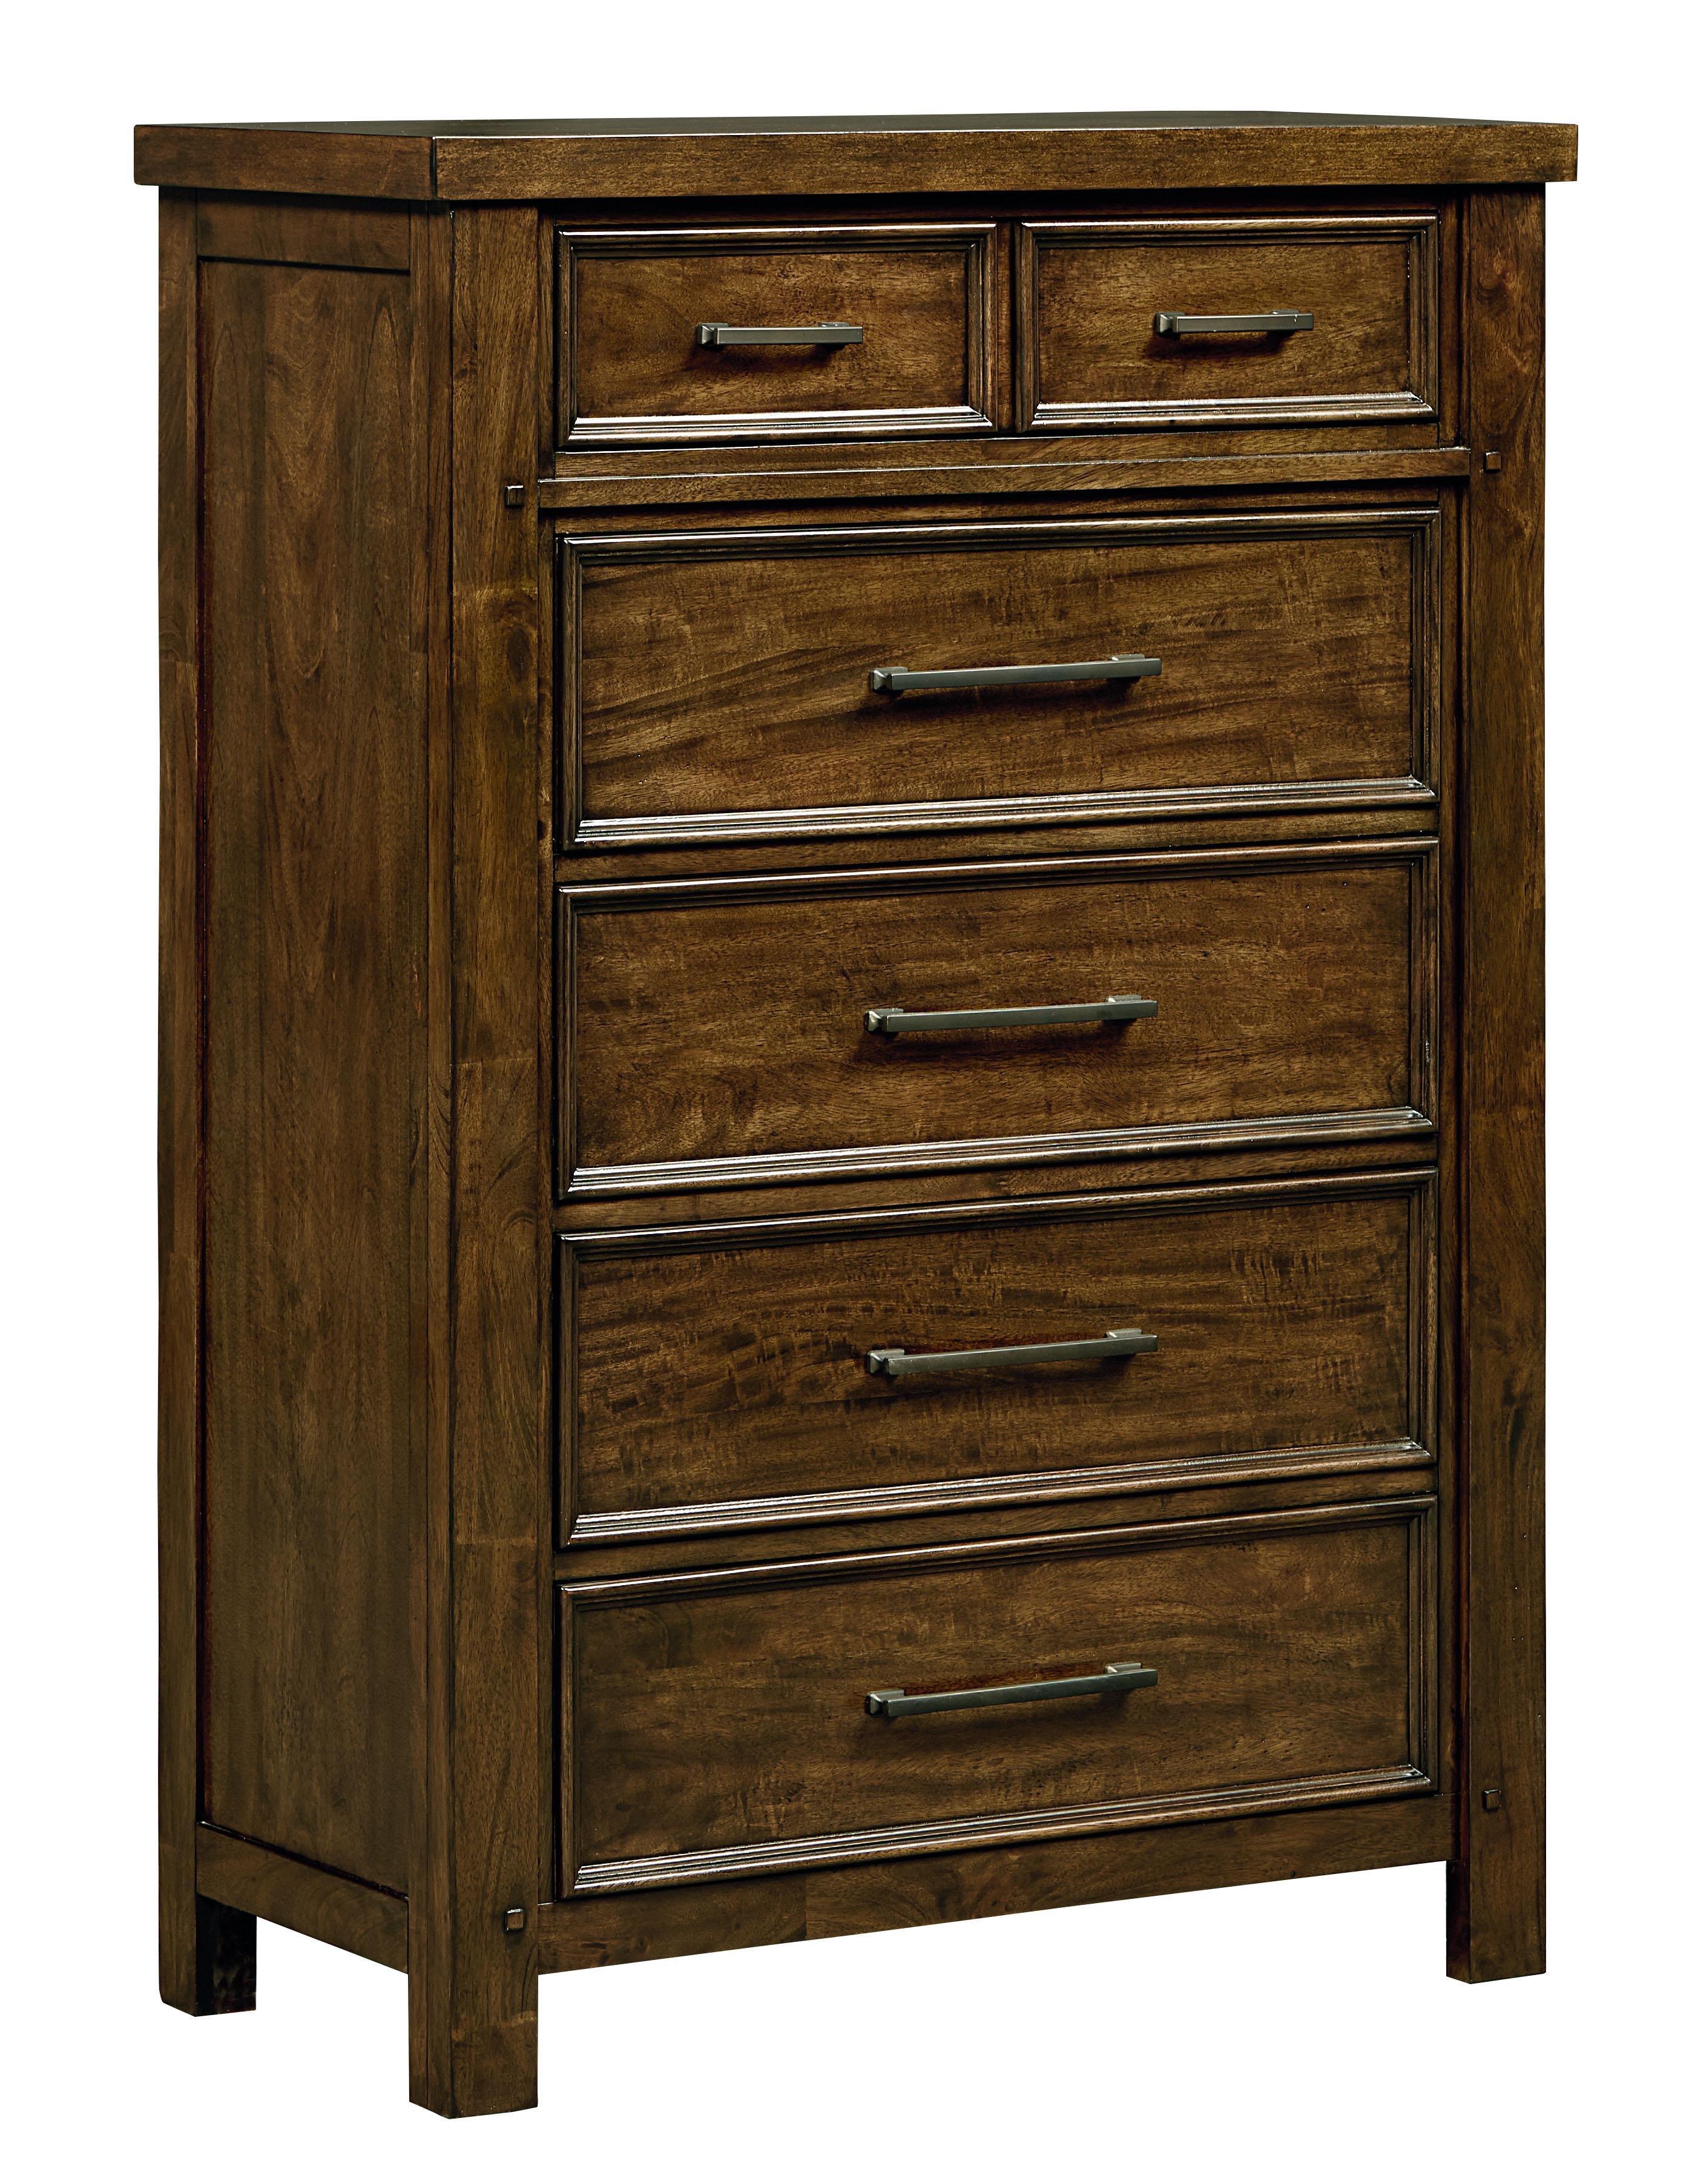 Standard Furniture Cameron Chest                                   - Item Number: 85155